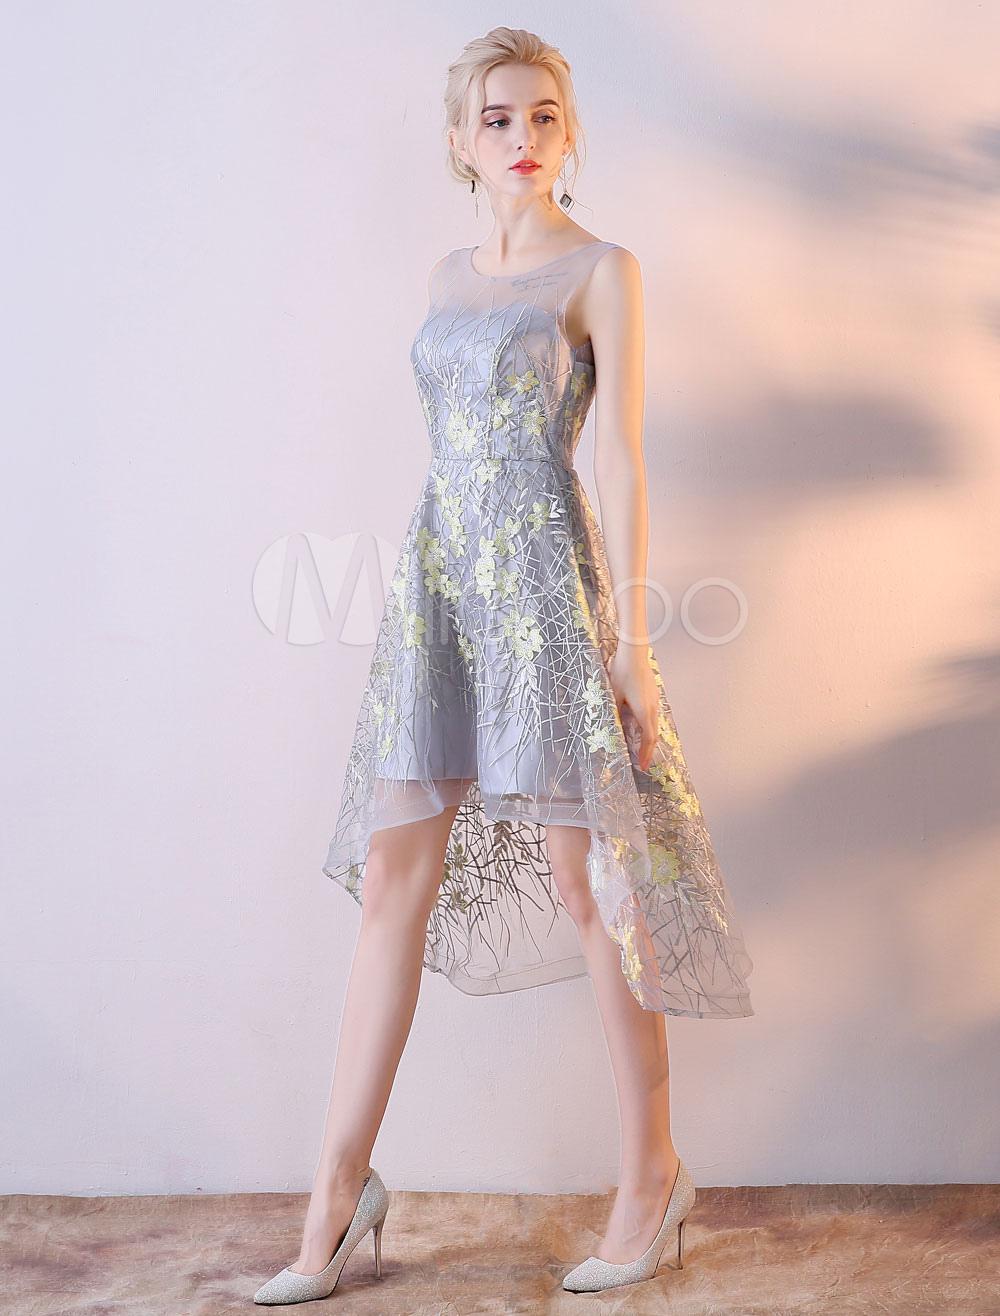 Lace Cocktail Dress Lace High Low Backless Short Graduation Party Dress (Wedding Cheap Party Dress) photo